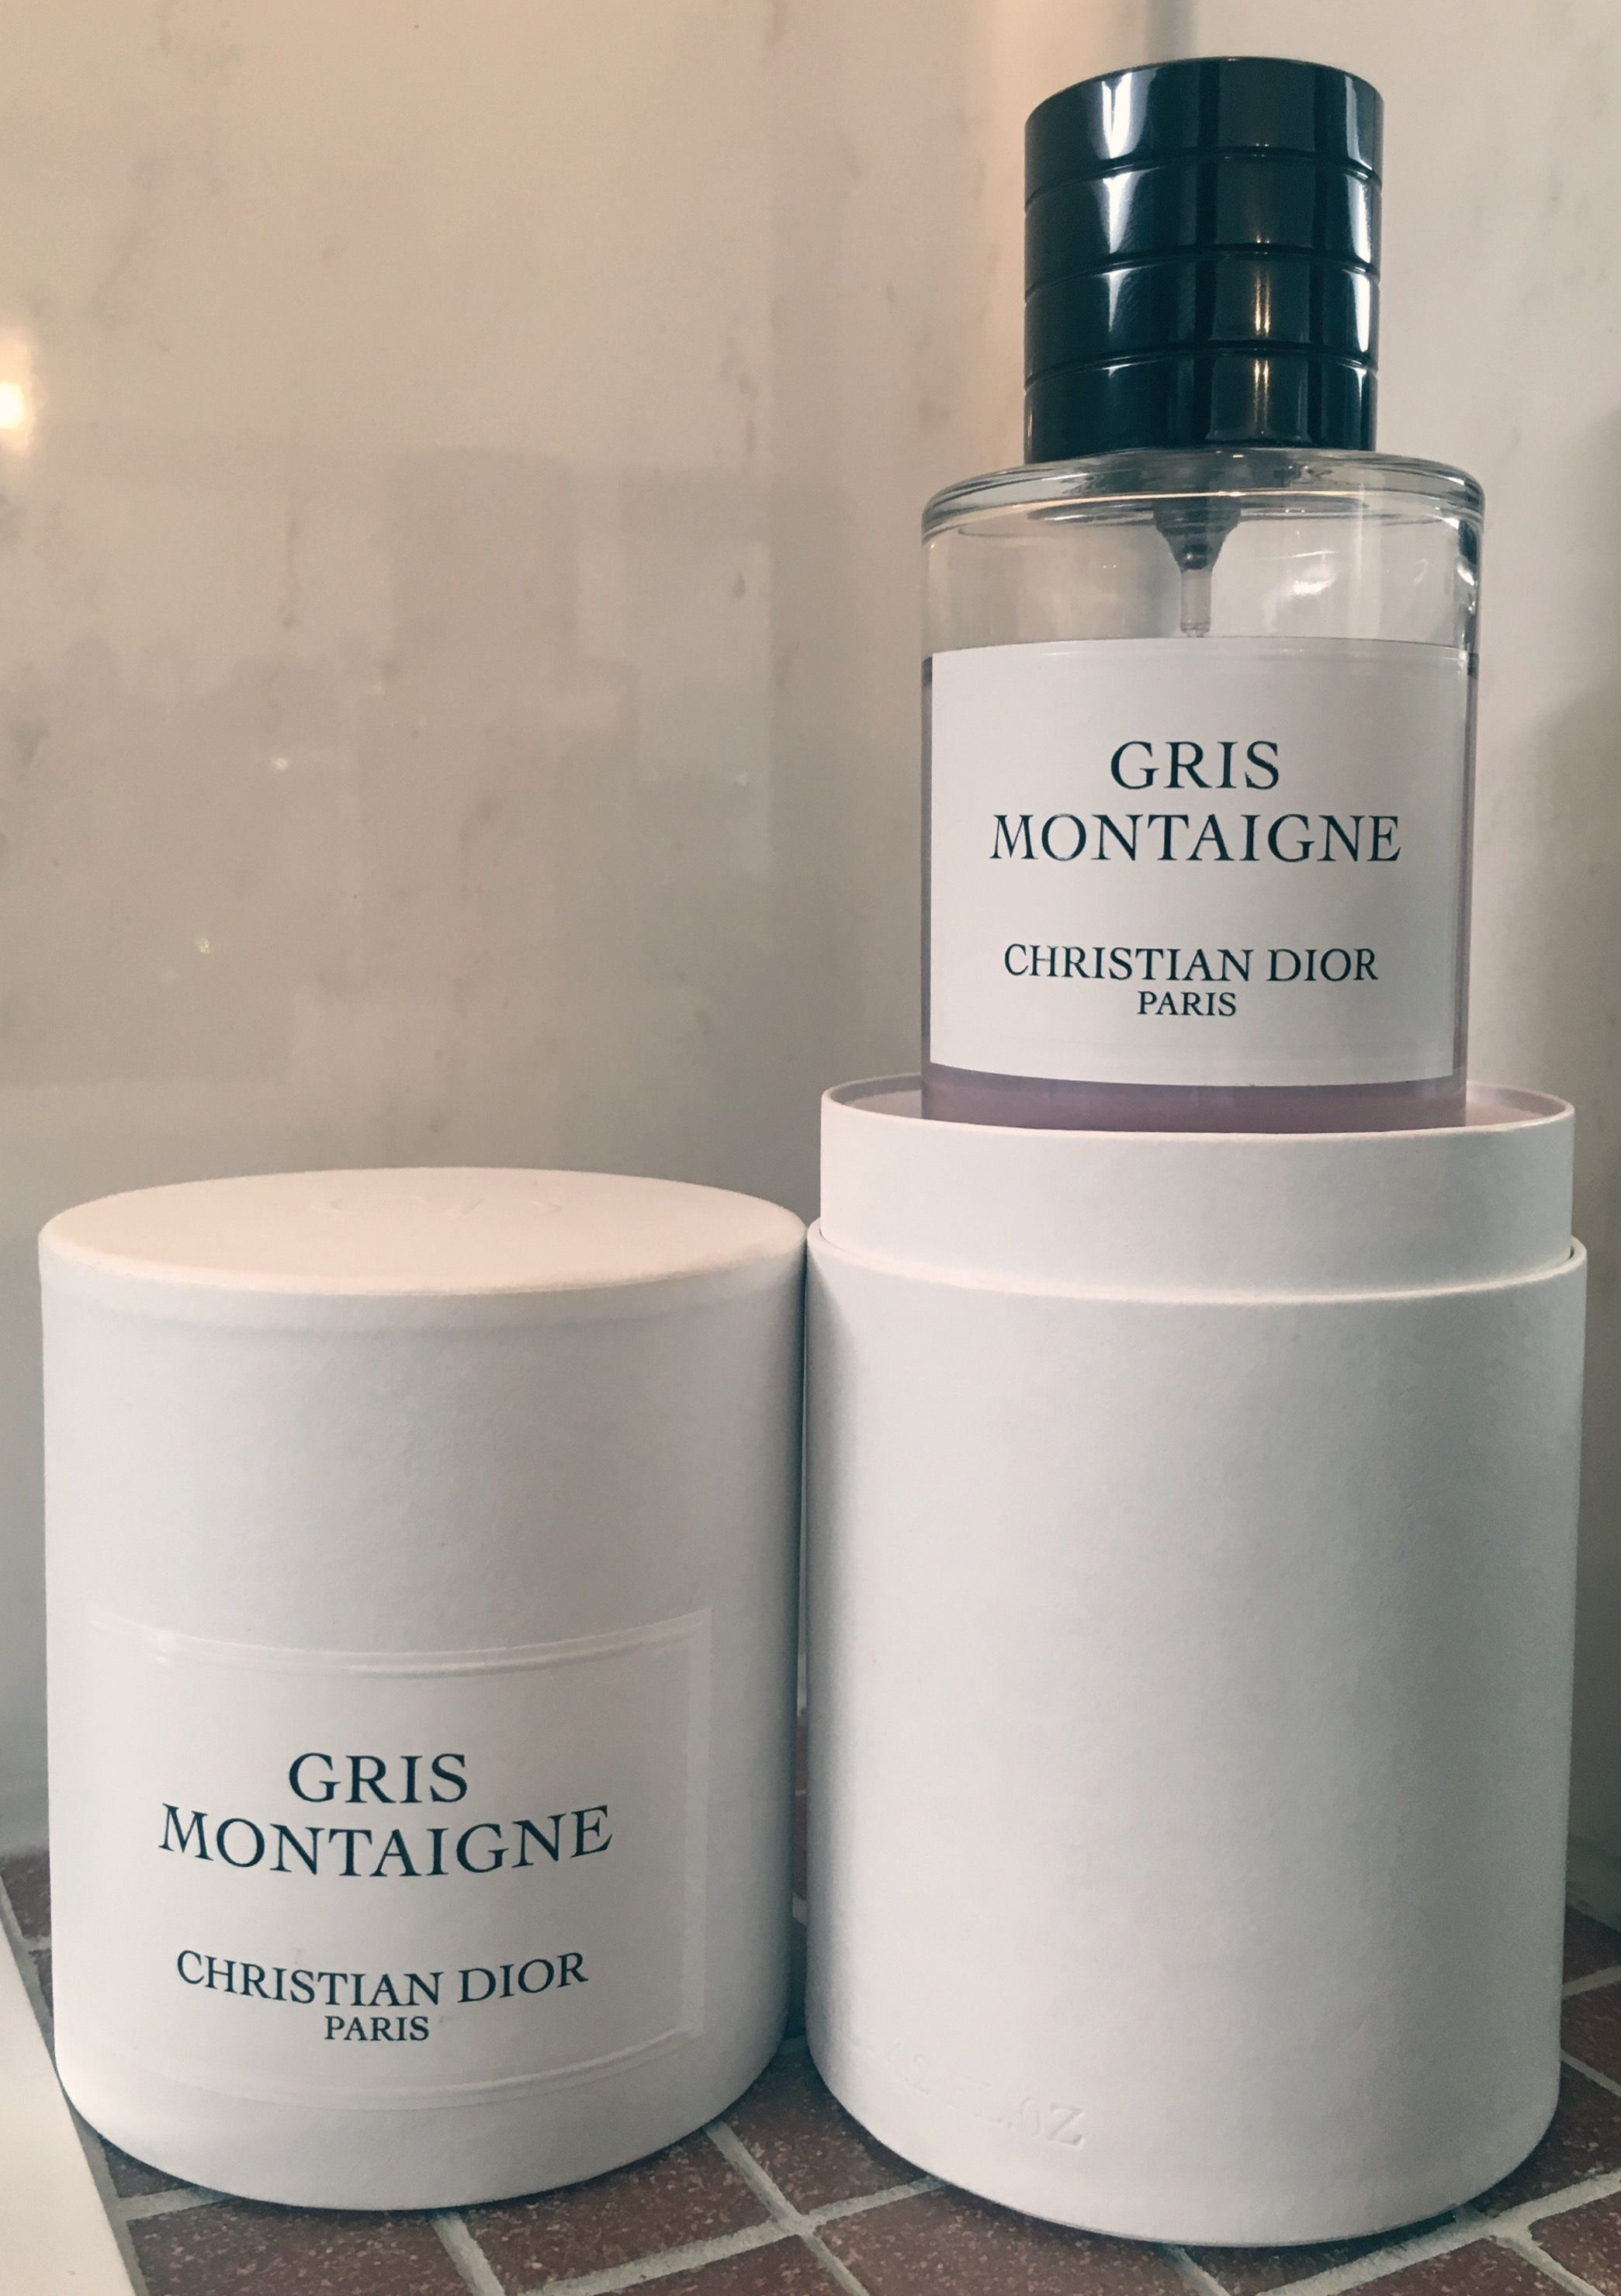 Gris Montaigne Christian Dior gris montaigne, christian dior, paris (with images) | ice